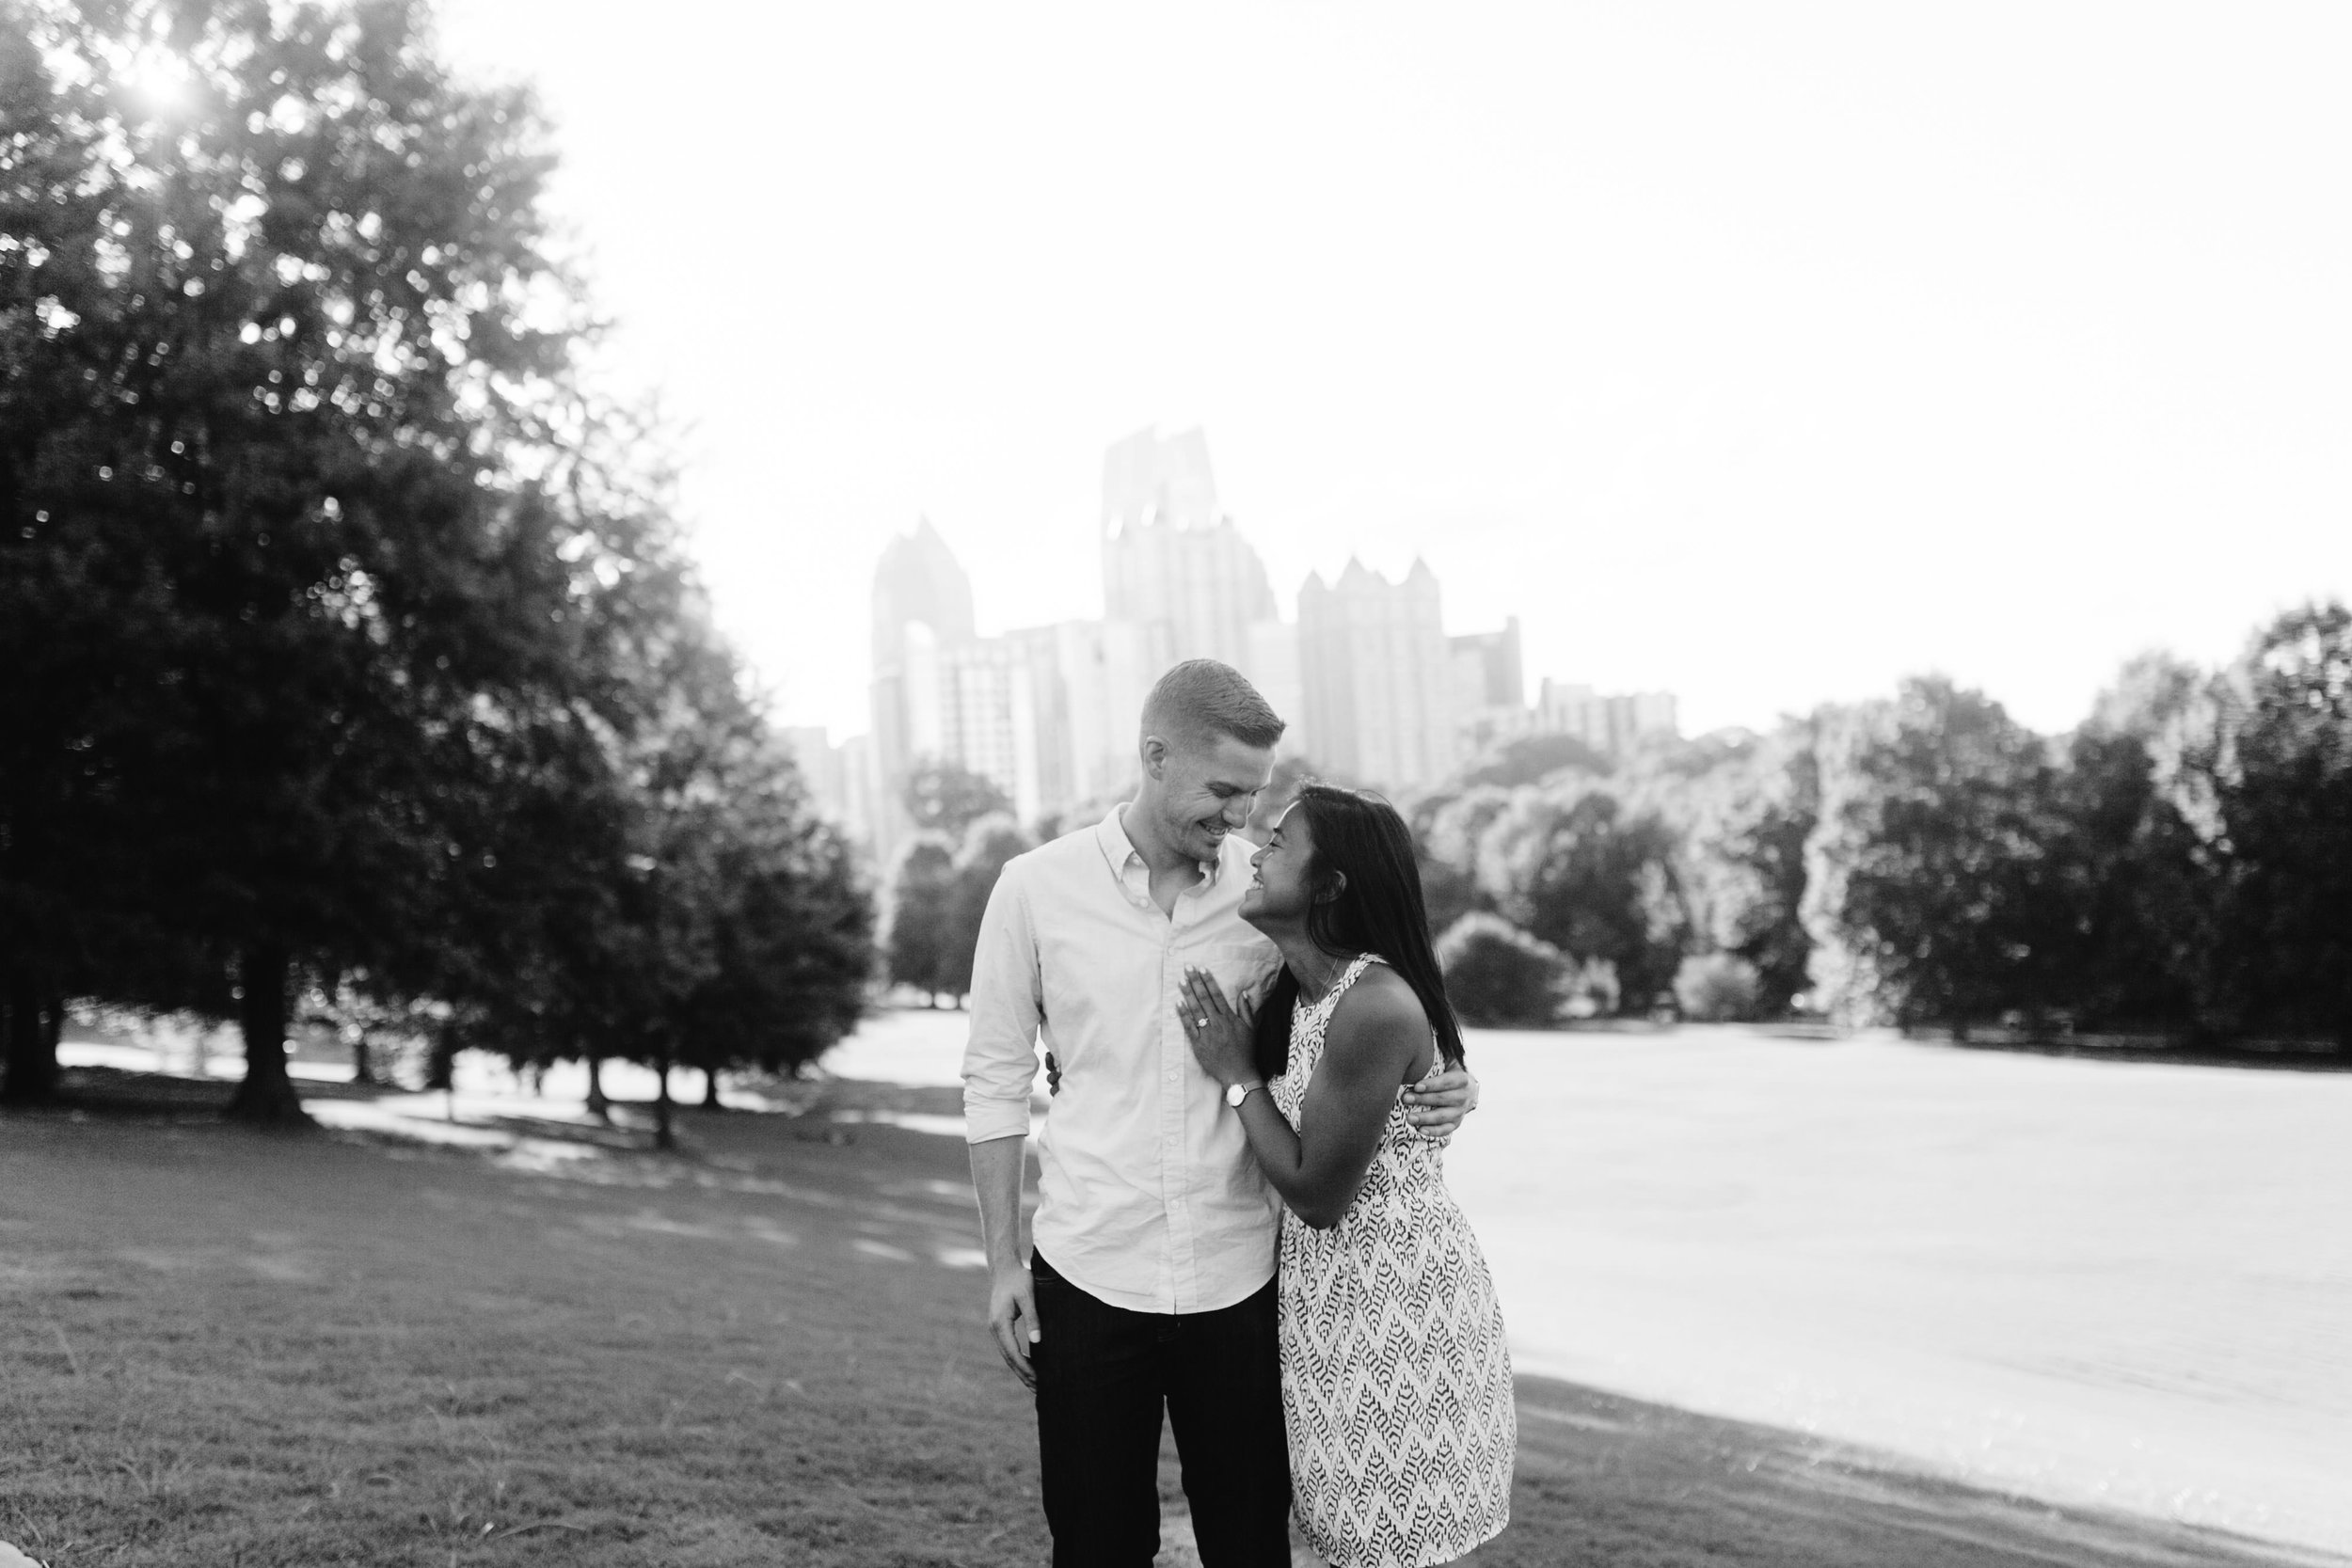 Piedmont-Park-Atlanta-Proposal-Kiyah-C-Photography-14.jpg